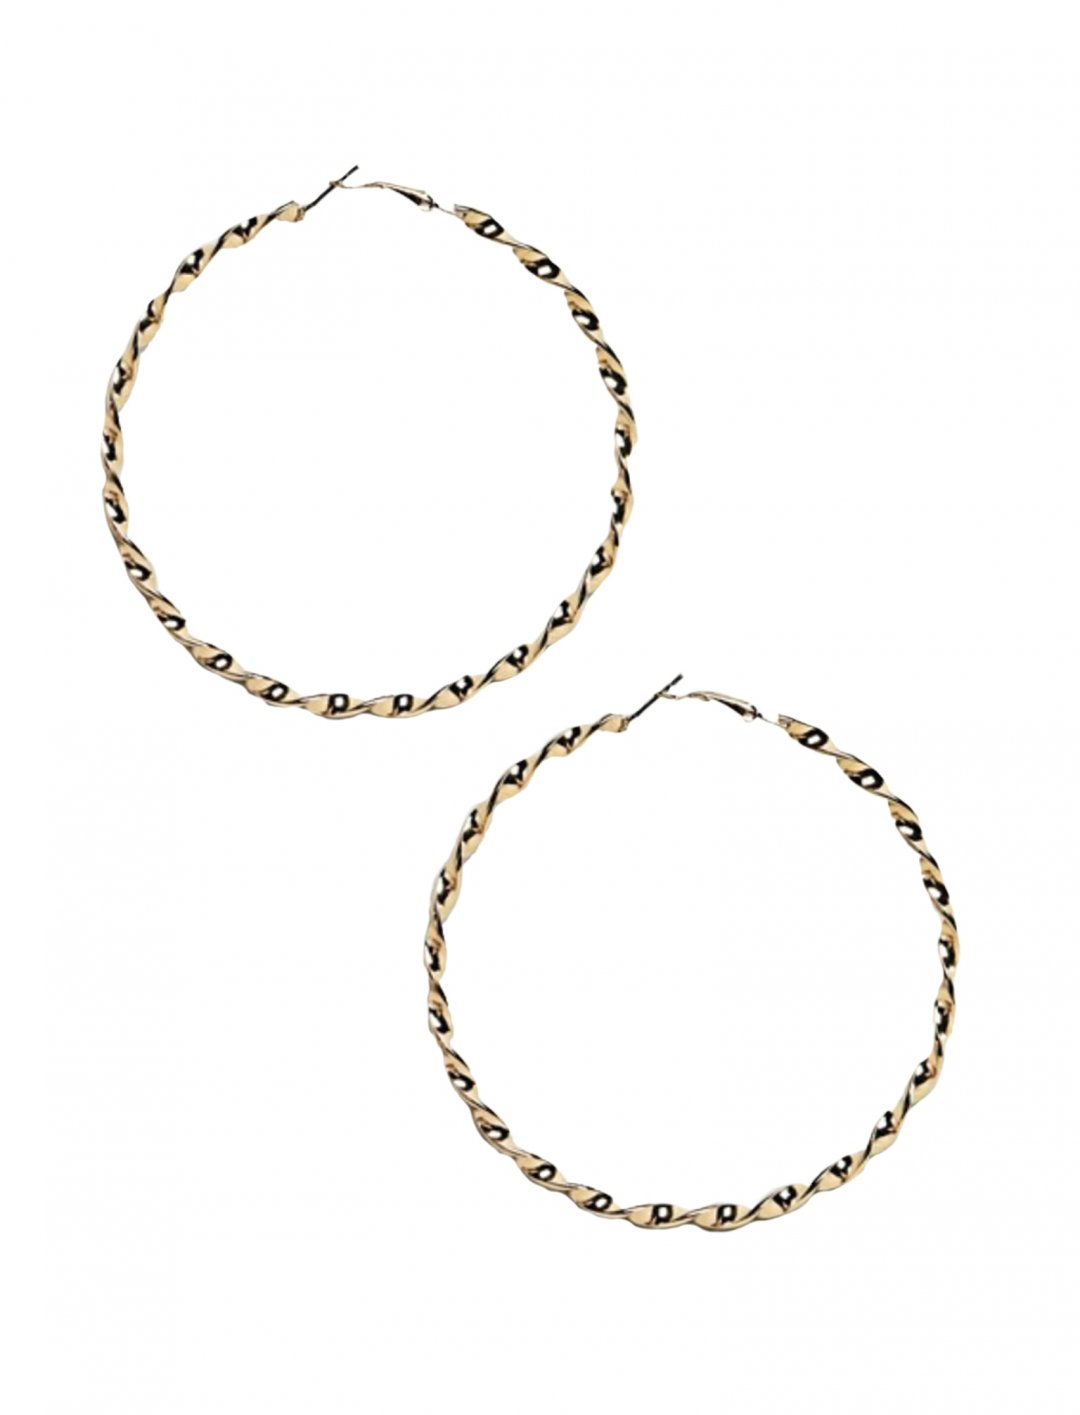 "DesignB London Hoop Earrings {""id"":10,""product_section_id"":1,""name"":""Jewellery"",""order"":10} DesignB London"